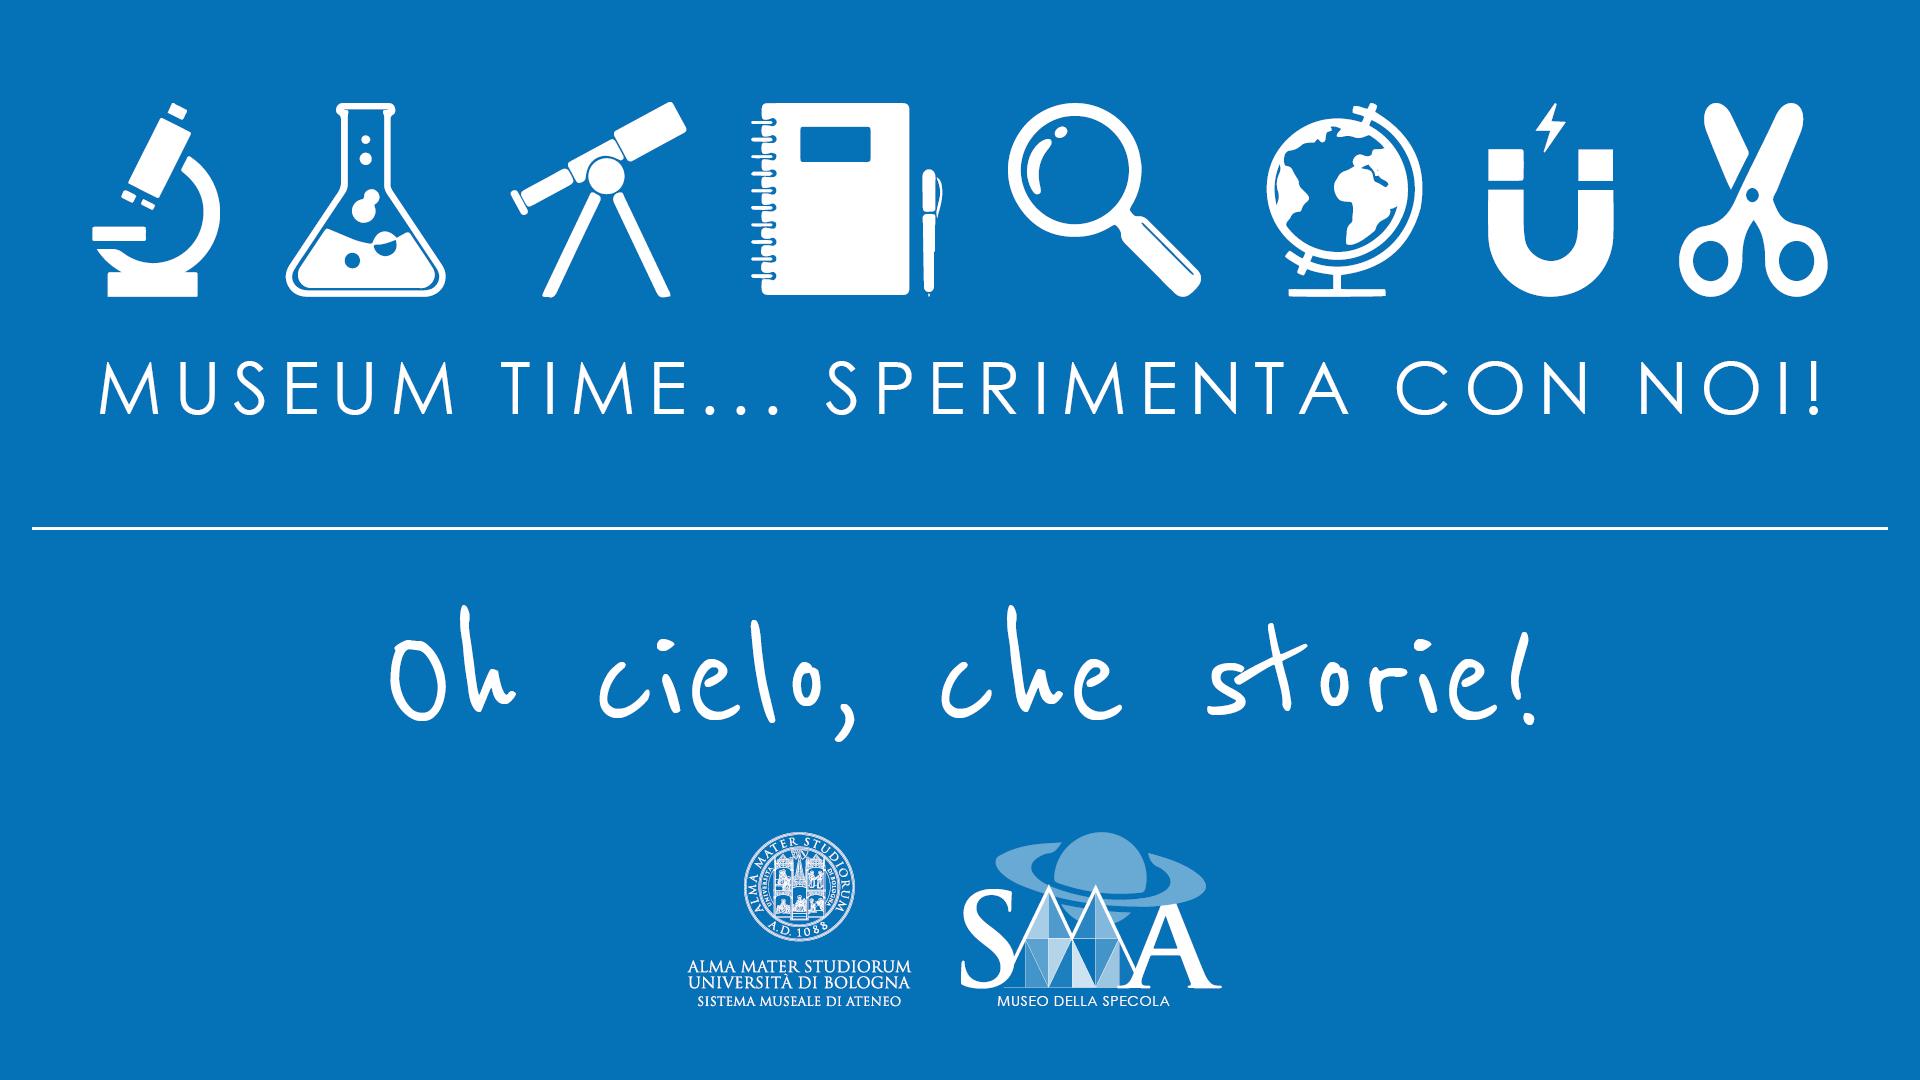 http://www.icom-italia.org/wp-content/uploads/wpforms/10320-faf7ed92f83be88bc622f726ed042c0c/Oh_cielo_che_storie-7bd03b5c1b331c88180c4a1e940af51c.jpg